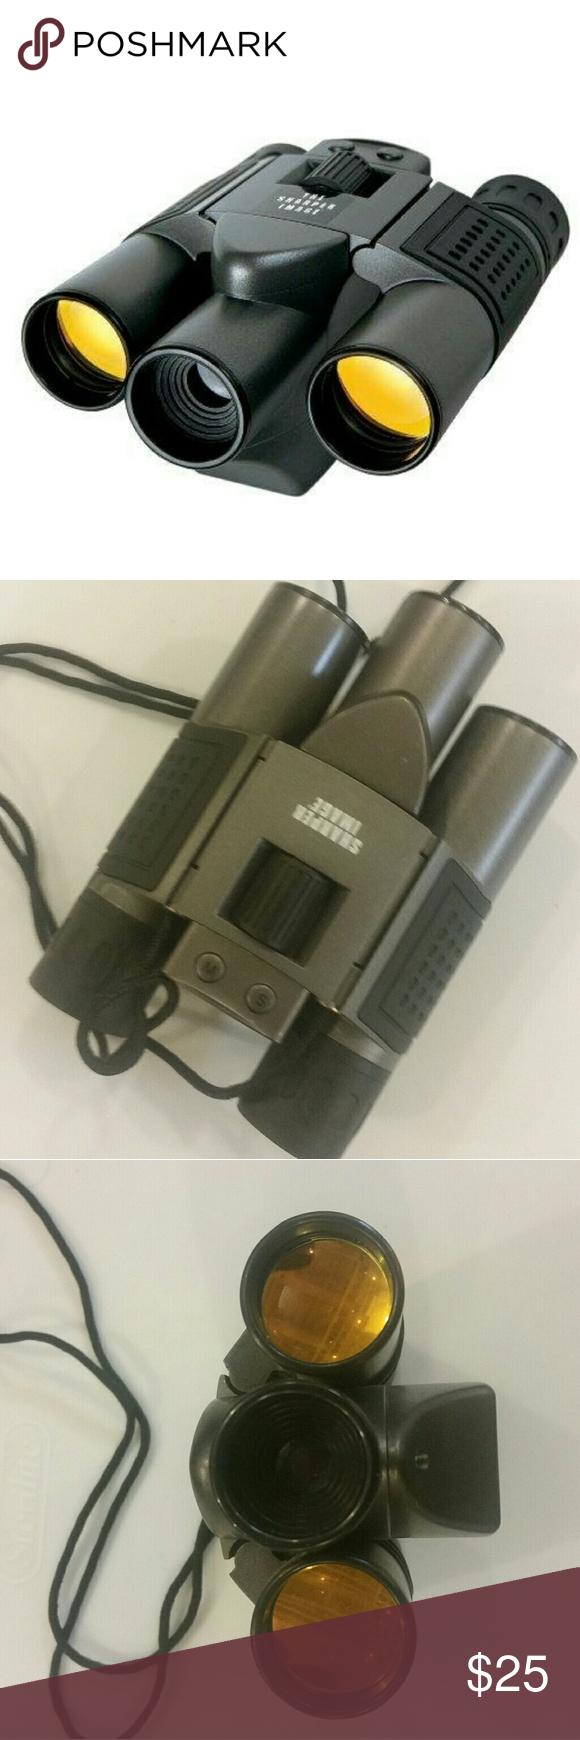 Sharper Image Binoculars My Posh Picks Pinterest Fashion Tips